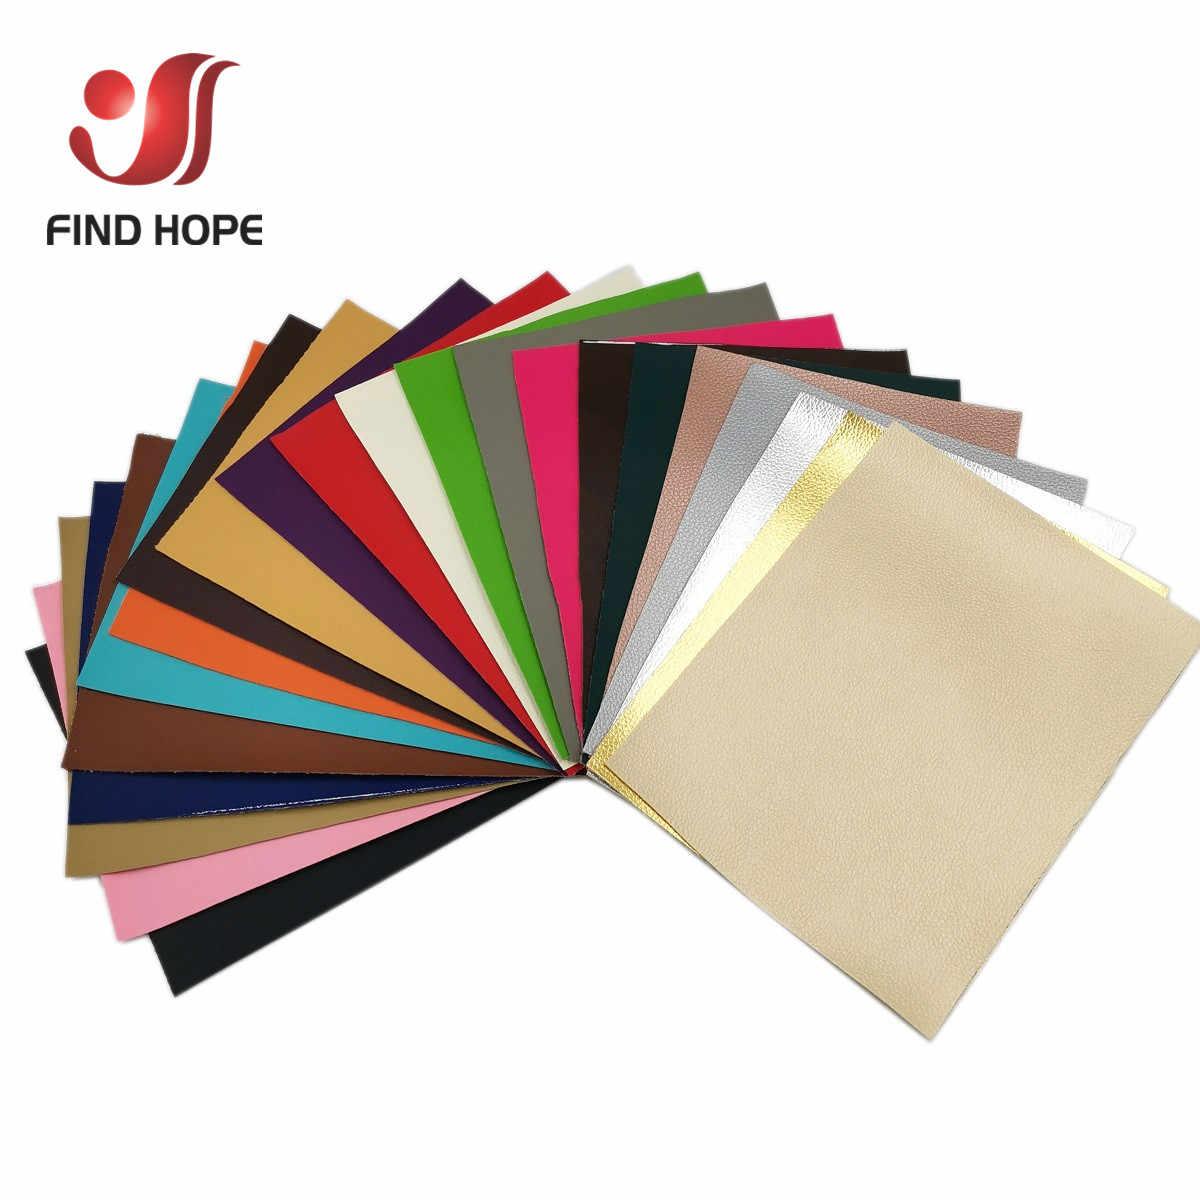 A4 A5 20*120CM Litchi PU Leder Vinyl Stoff Faux Leder Für Ohrring Nähen Tasche Kleidung Sofa Auto DIY Bogen Material Blatt Rolle